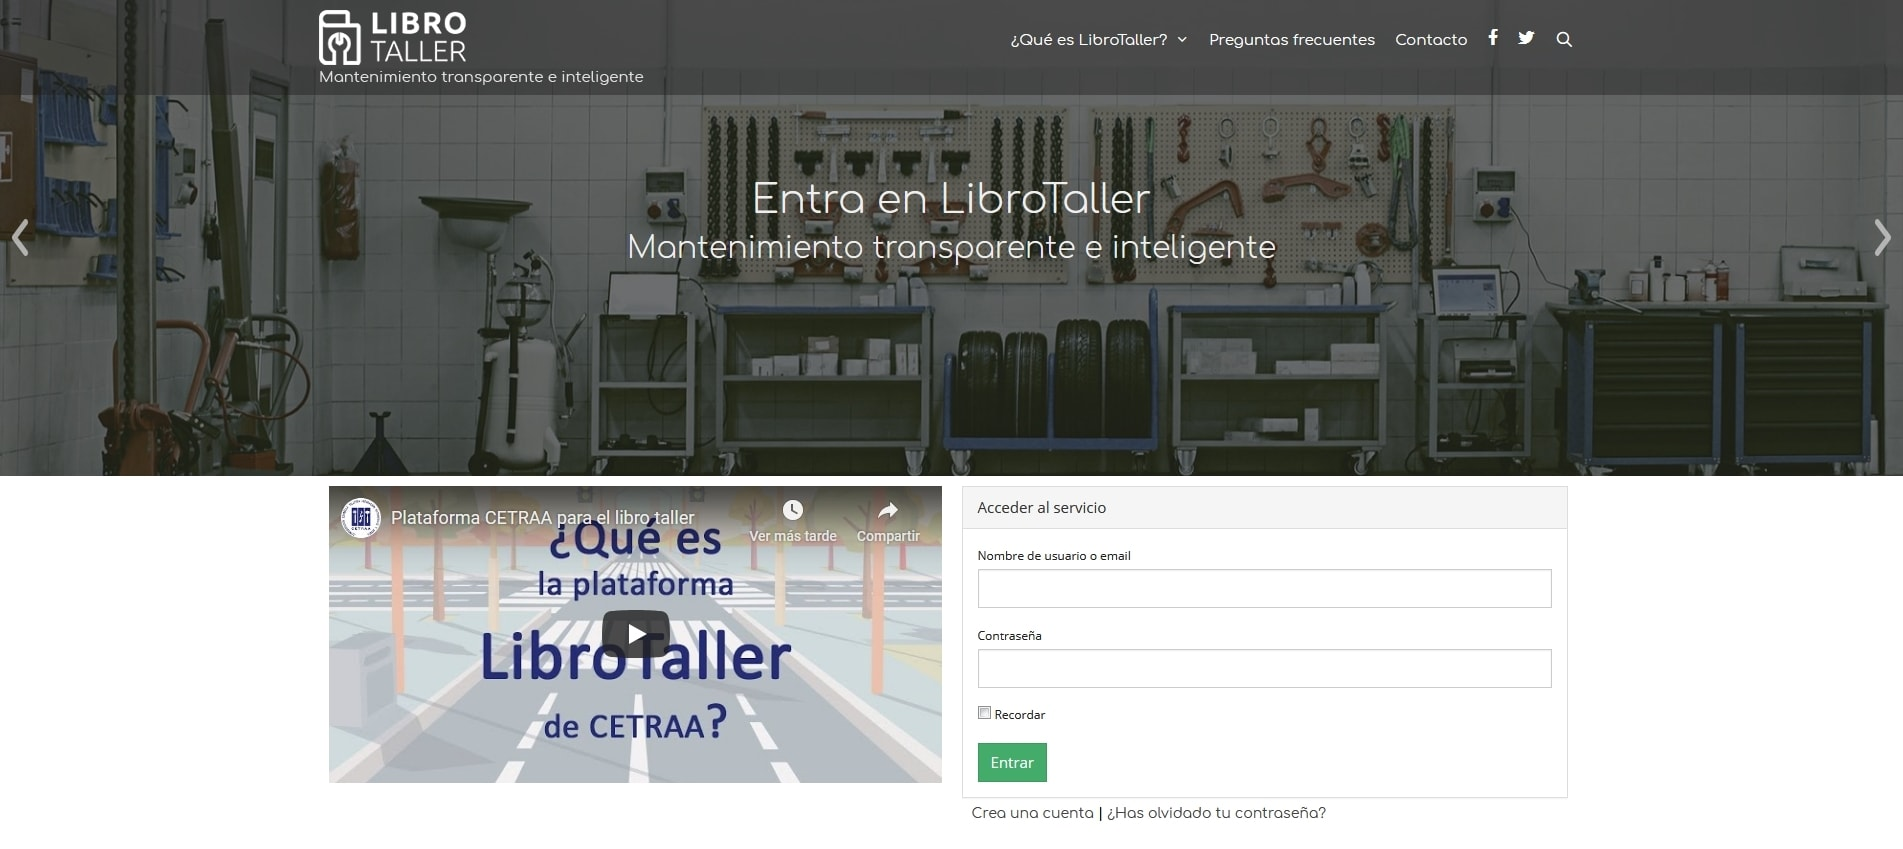 Historial ITV en LibroTaller.com